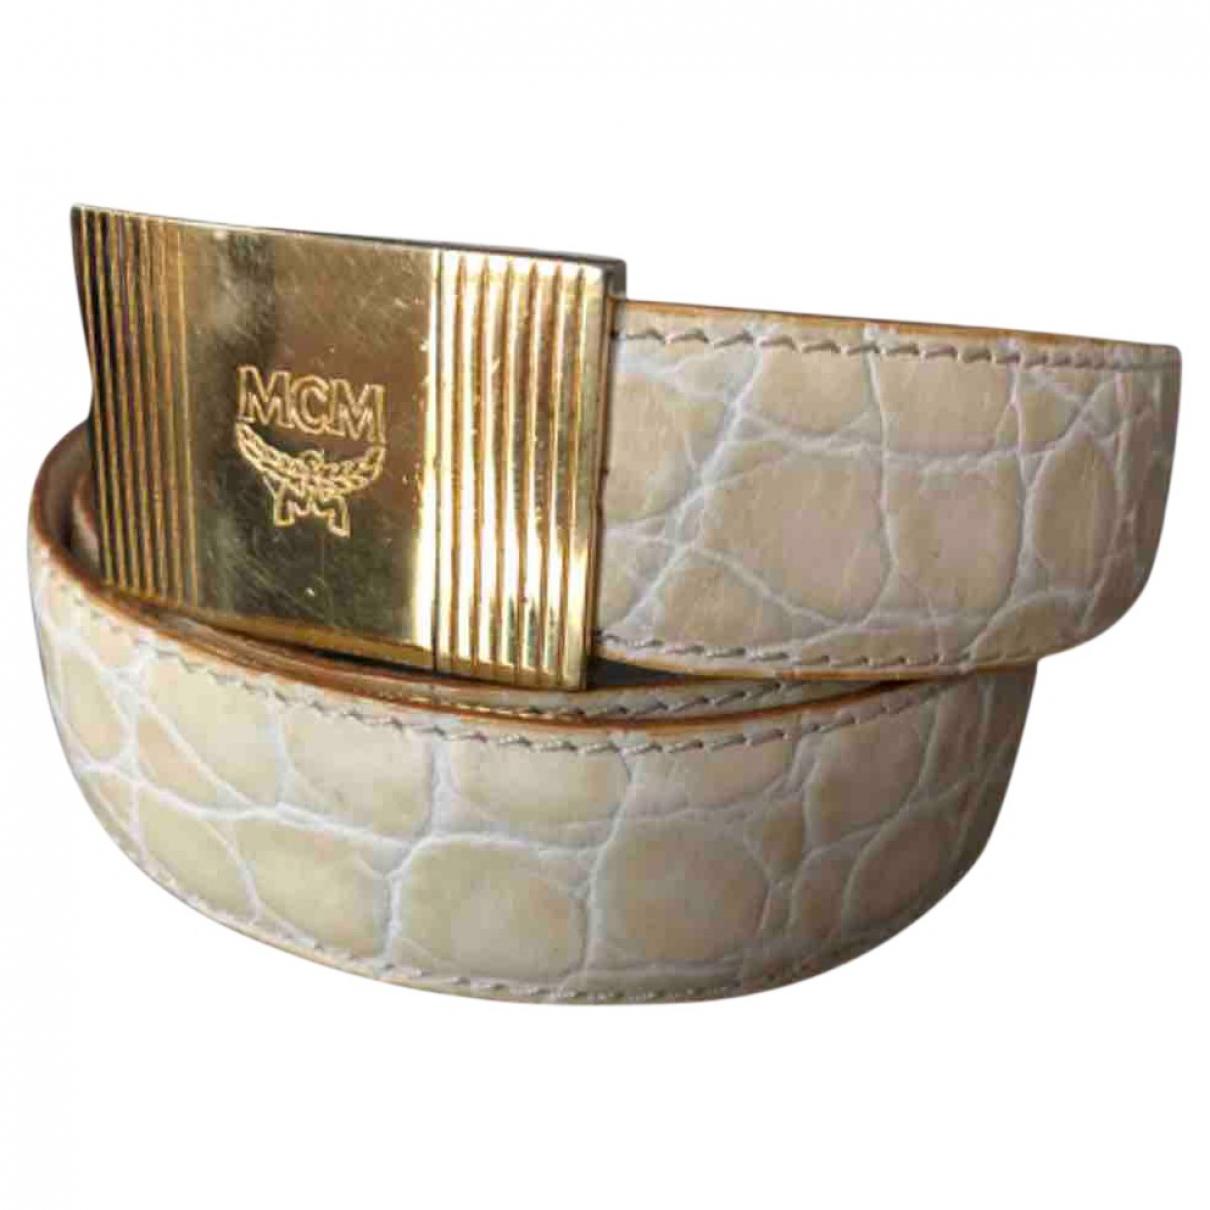 Mcm \N Beige Leather belt for Women 95 cm